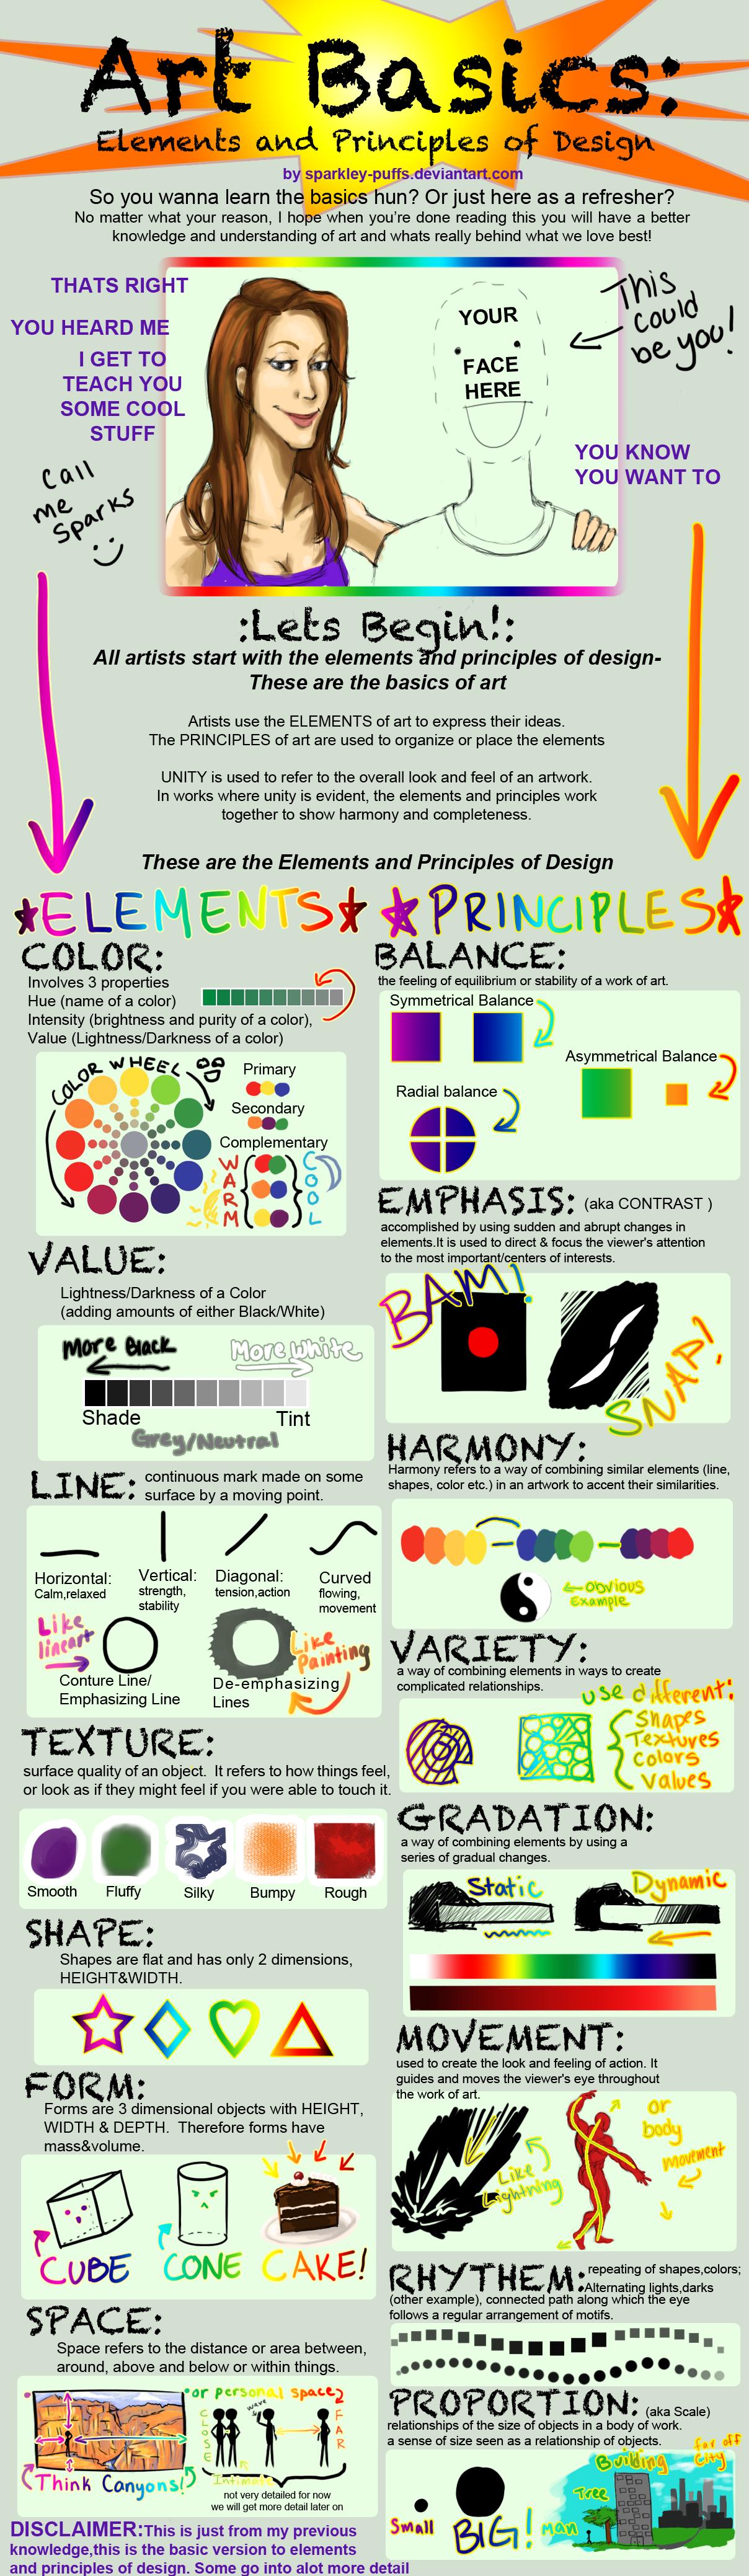 Elements Principles Of Design By Sparkley Puffs D3j3dj8